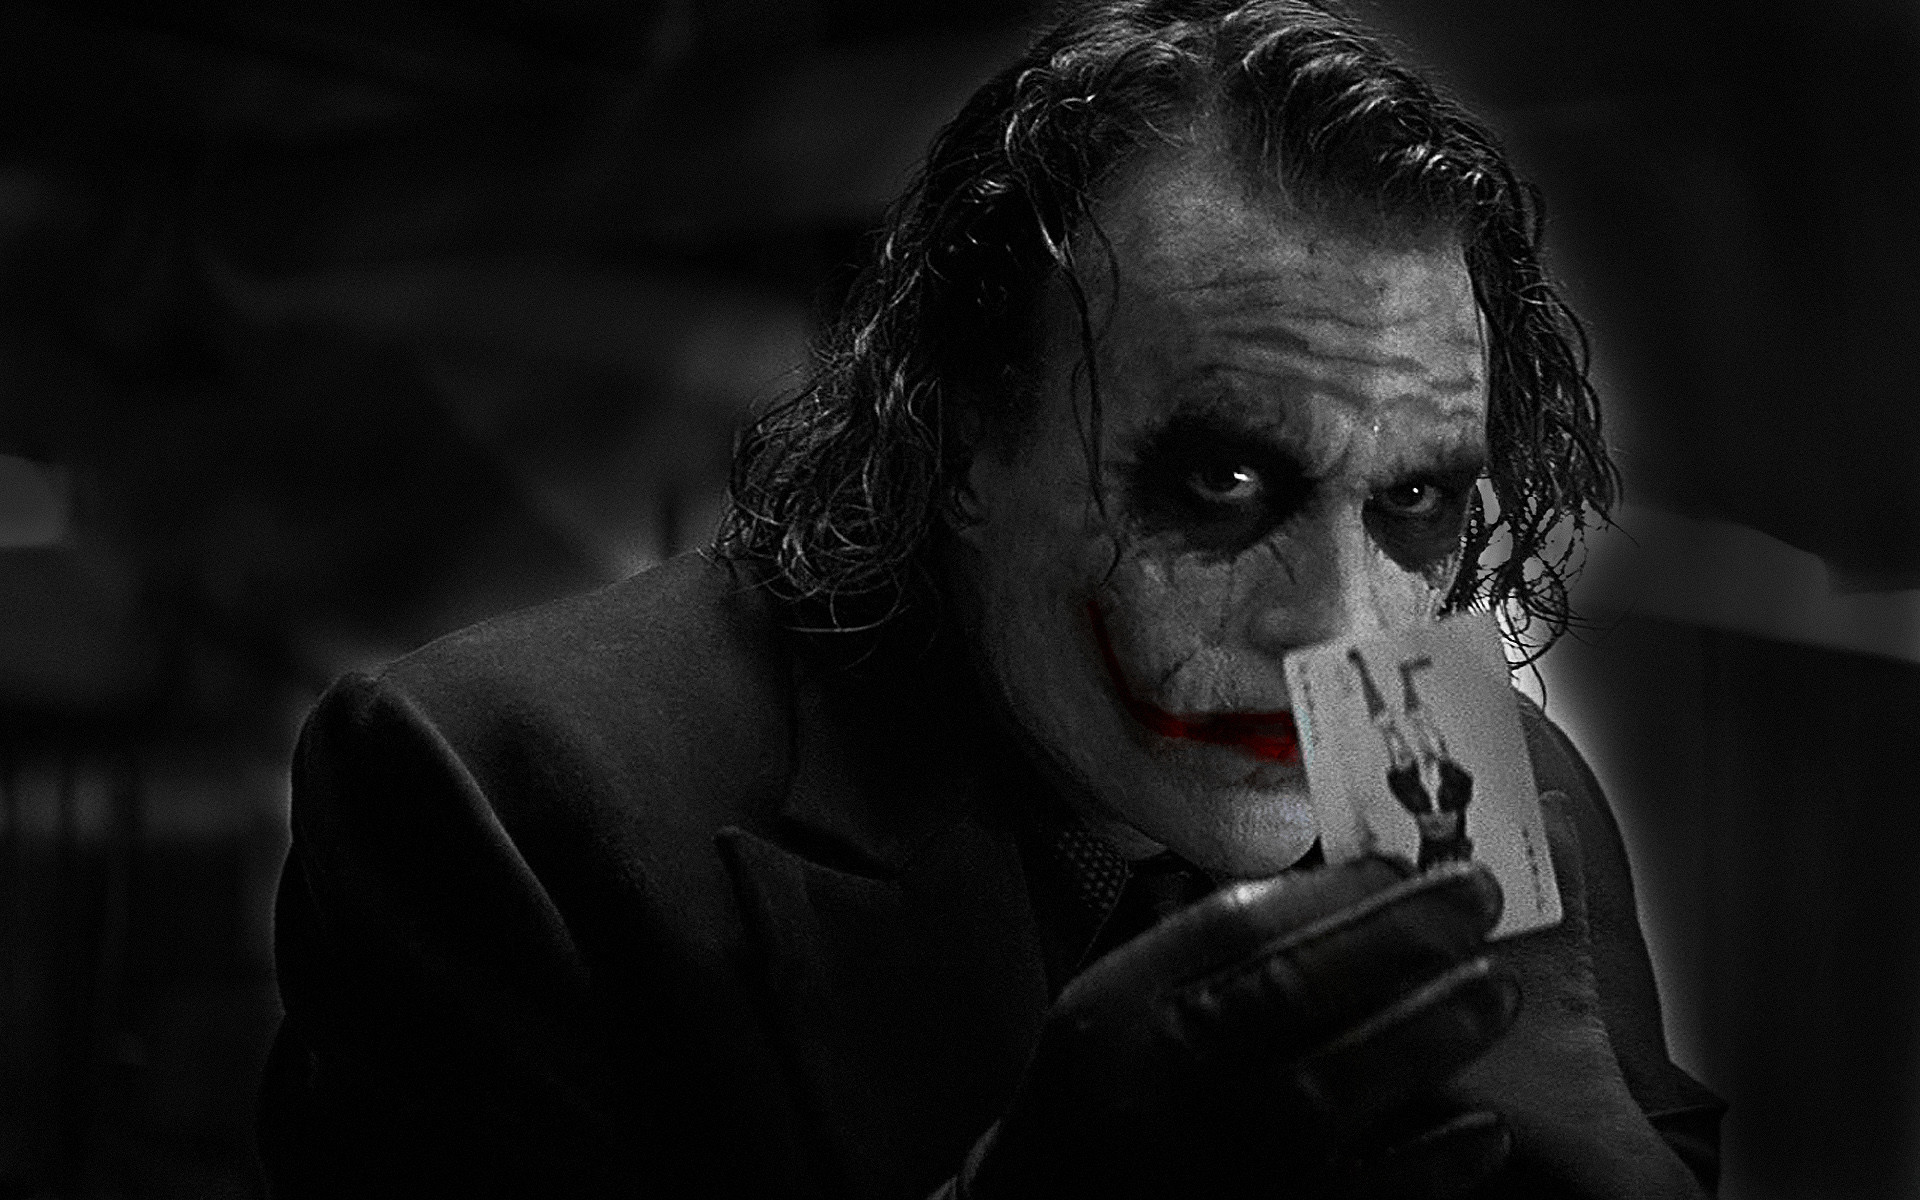 Movies the joker heath ledger batman the dark knight wallpaper |  | 11211 | WallpaperUP